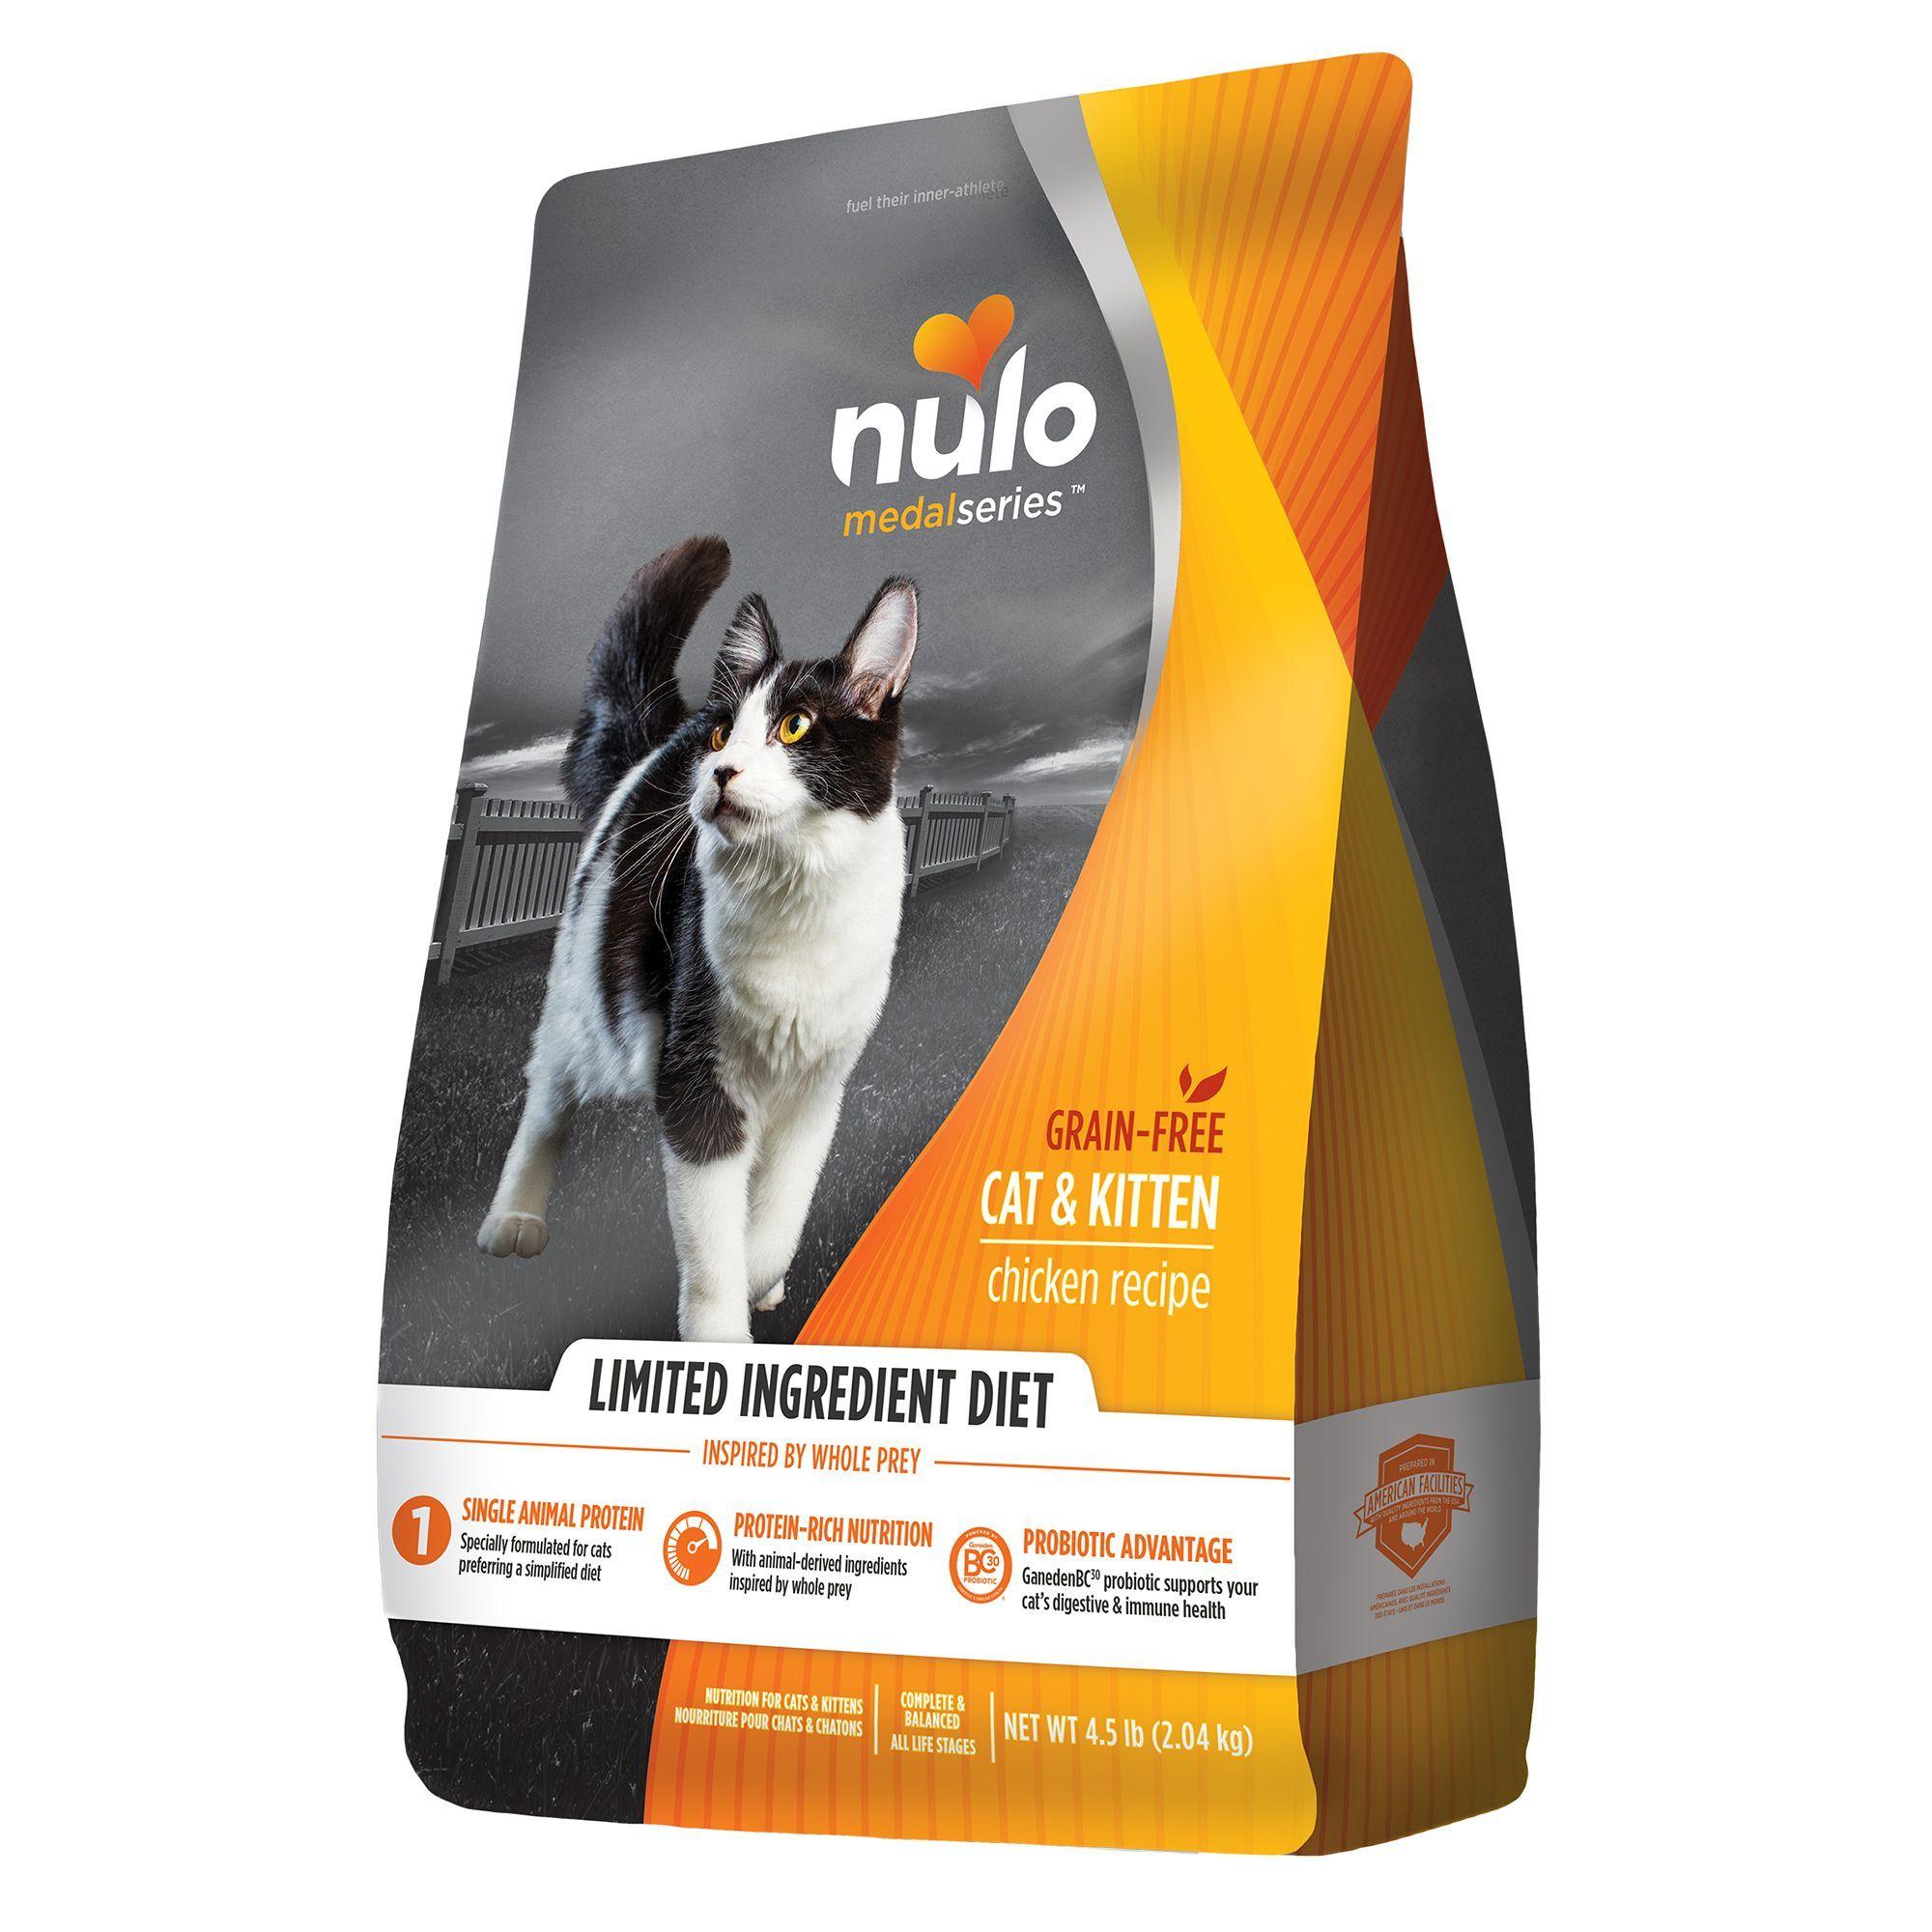 Nulo Medalseries Limited Ingredient Cat Food Grain Free Size